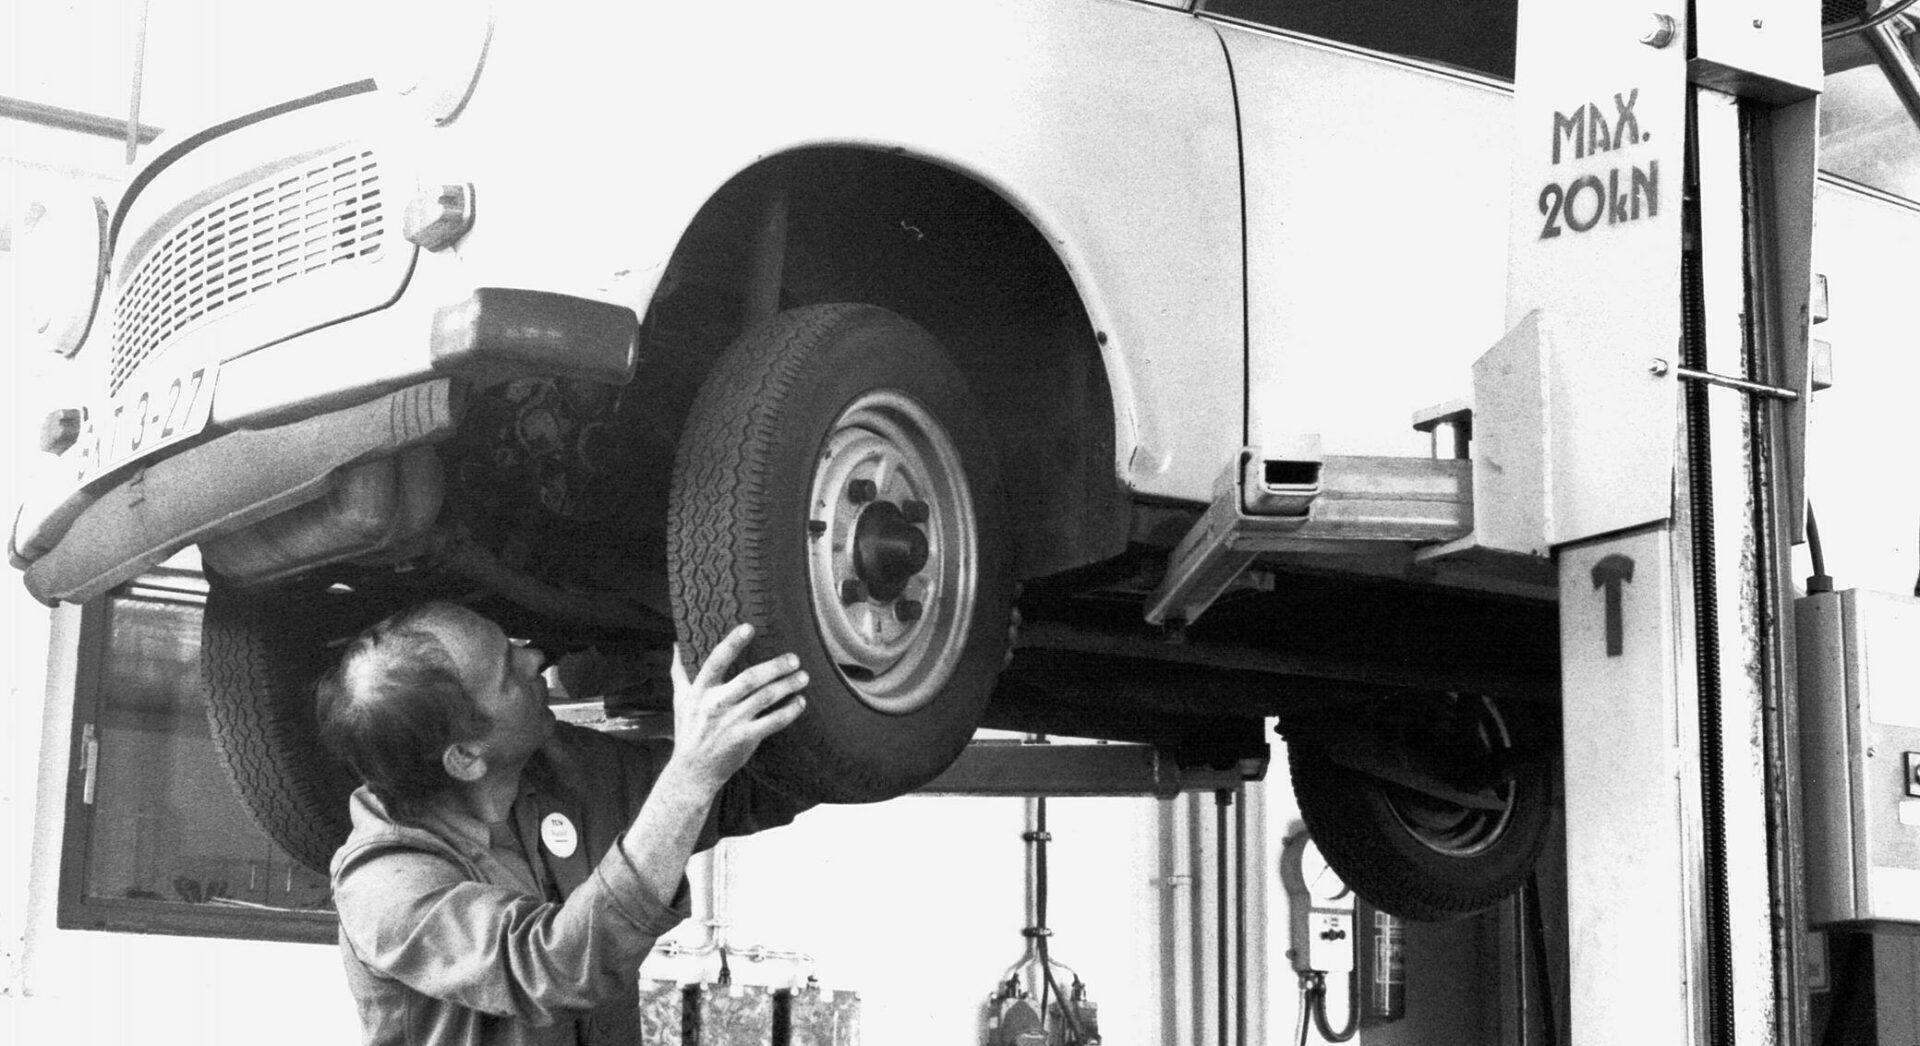 TÜV-Antik letzte Jahrhundert. Kann der TÜV agile?